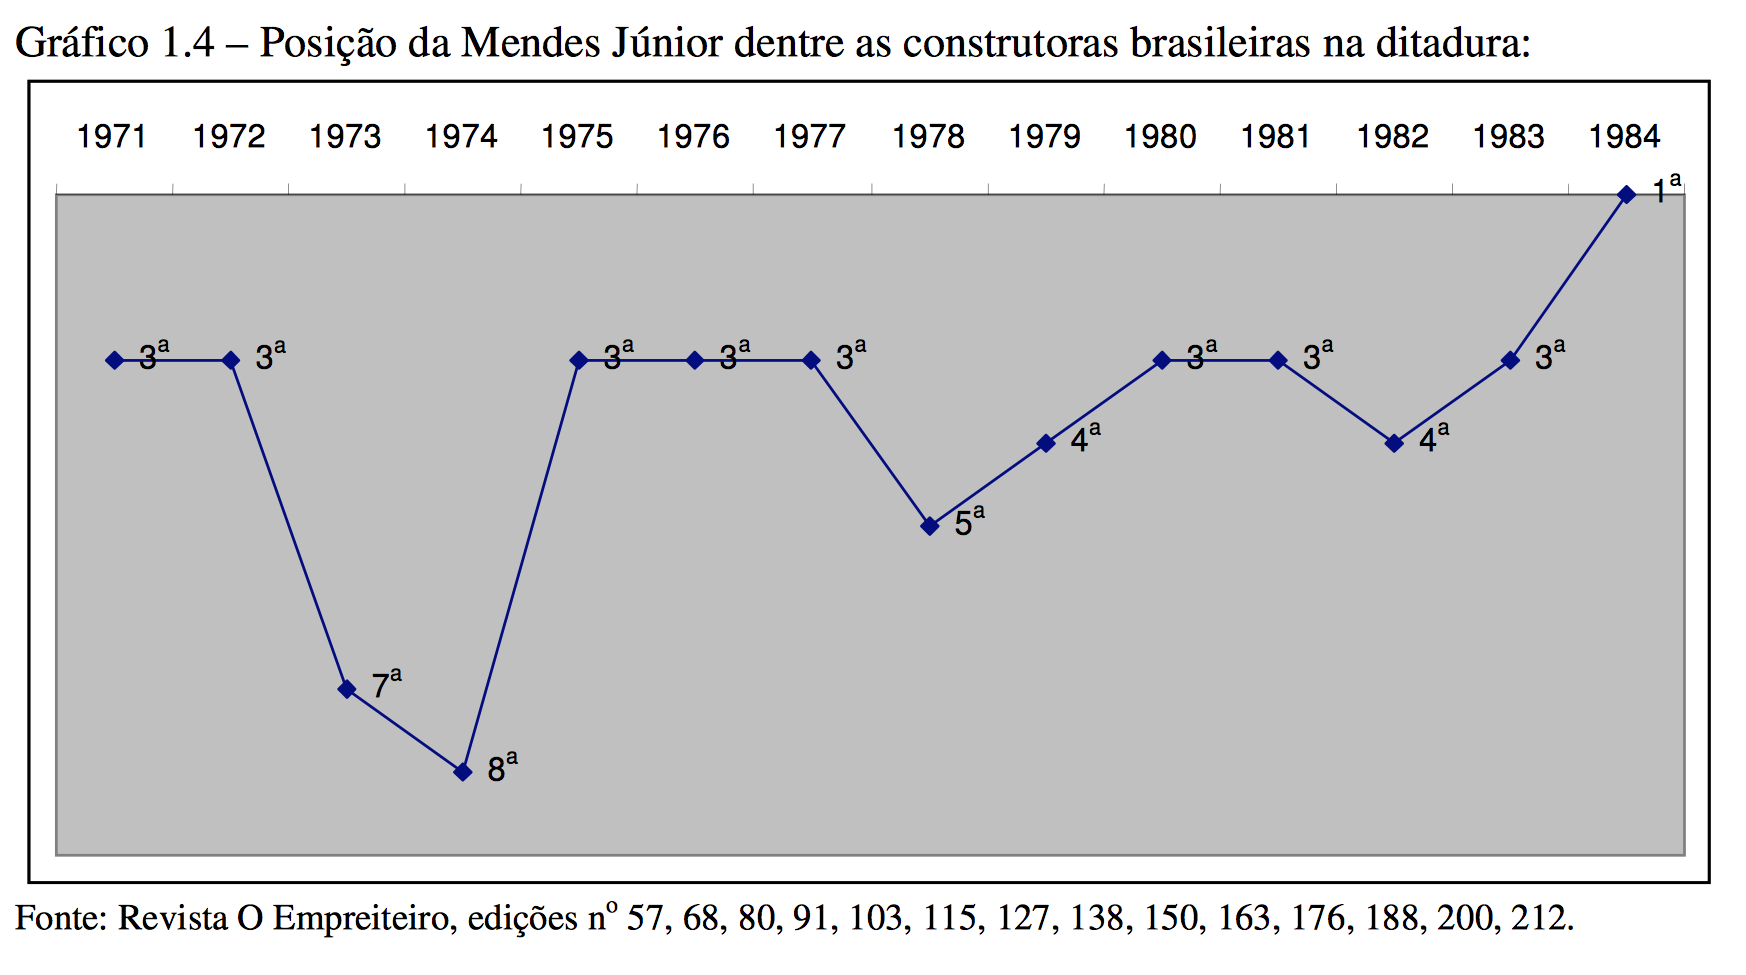 Ranking-MendesJunior-ditadura